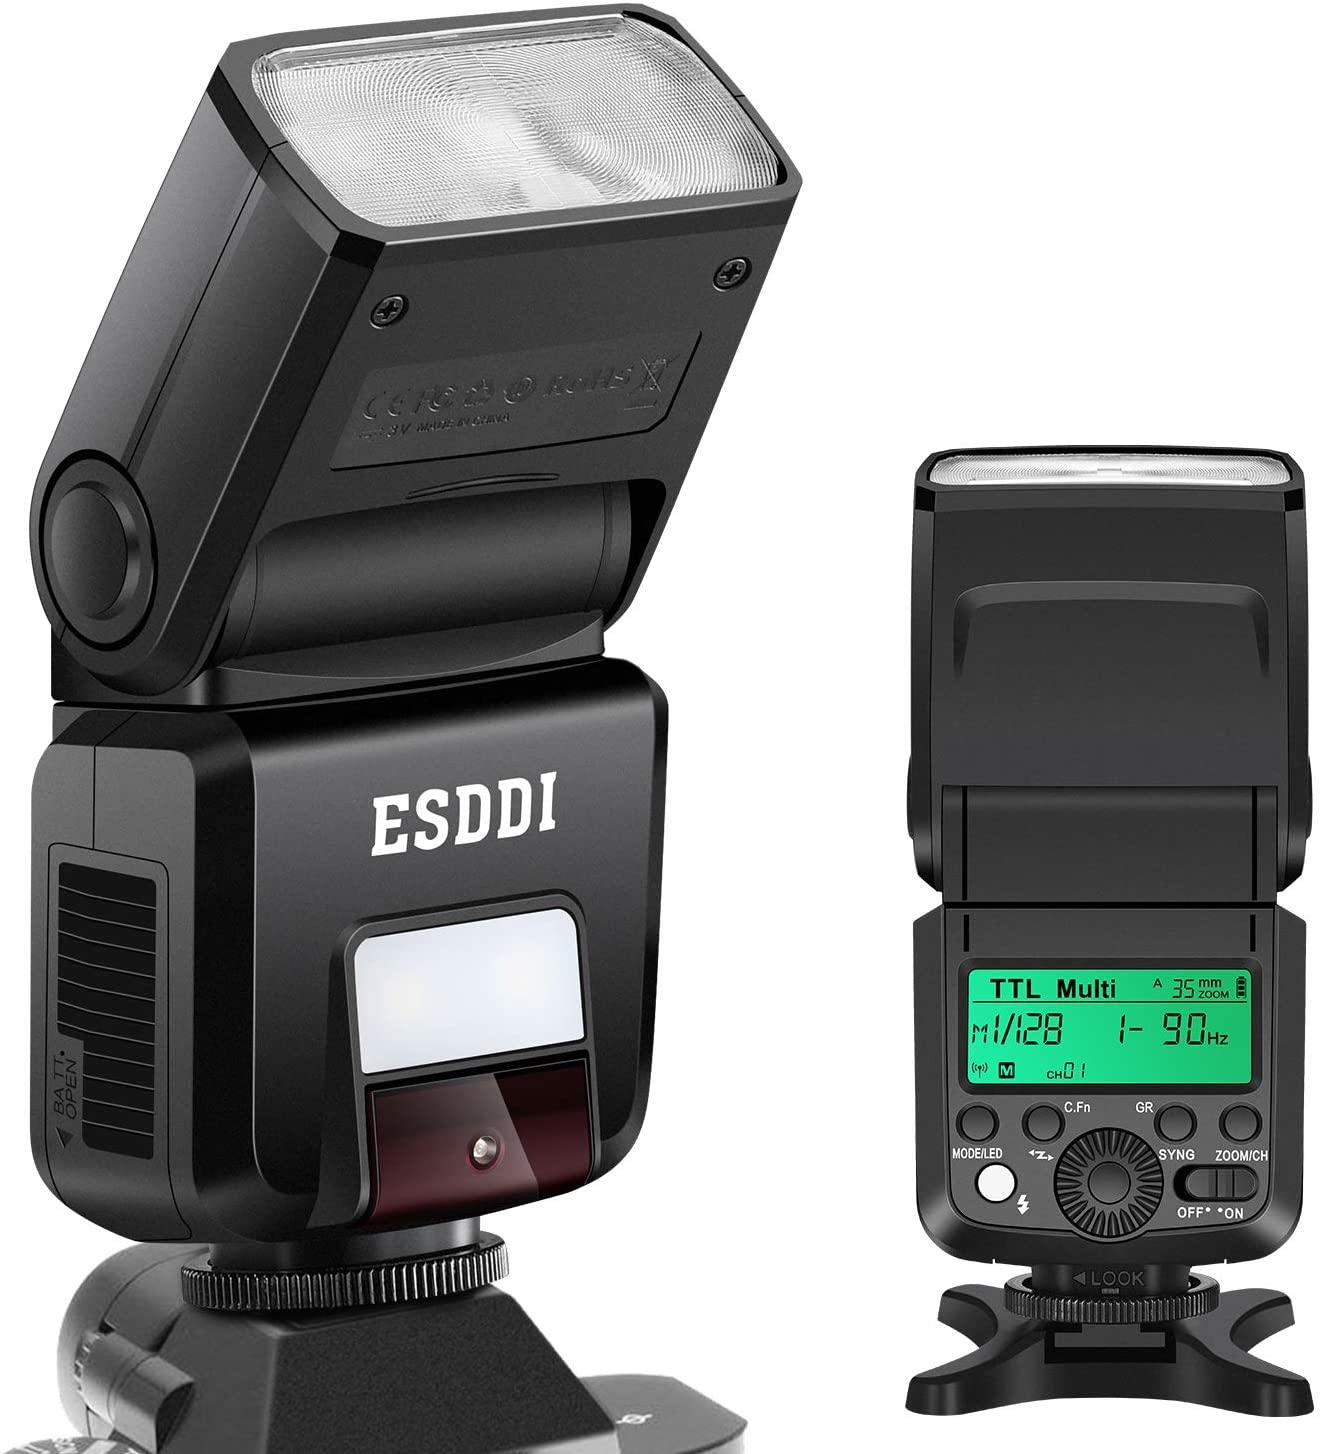 Flash cámara ESDDI con pantalla LCD para Sony